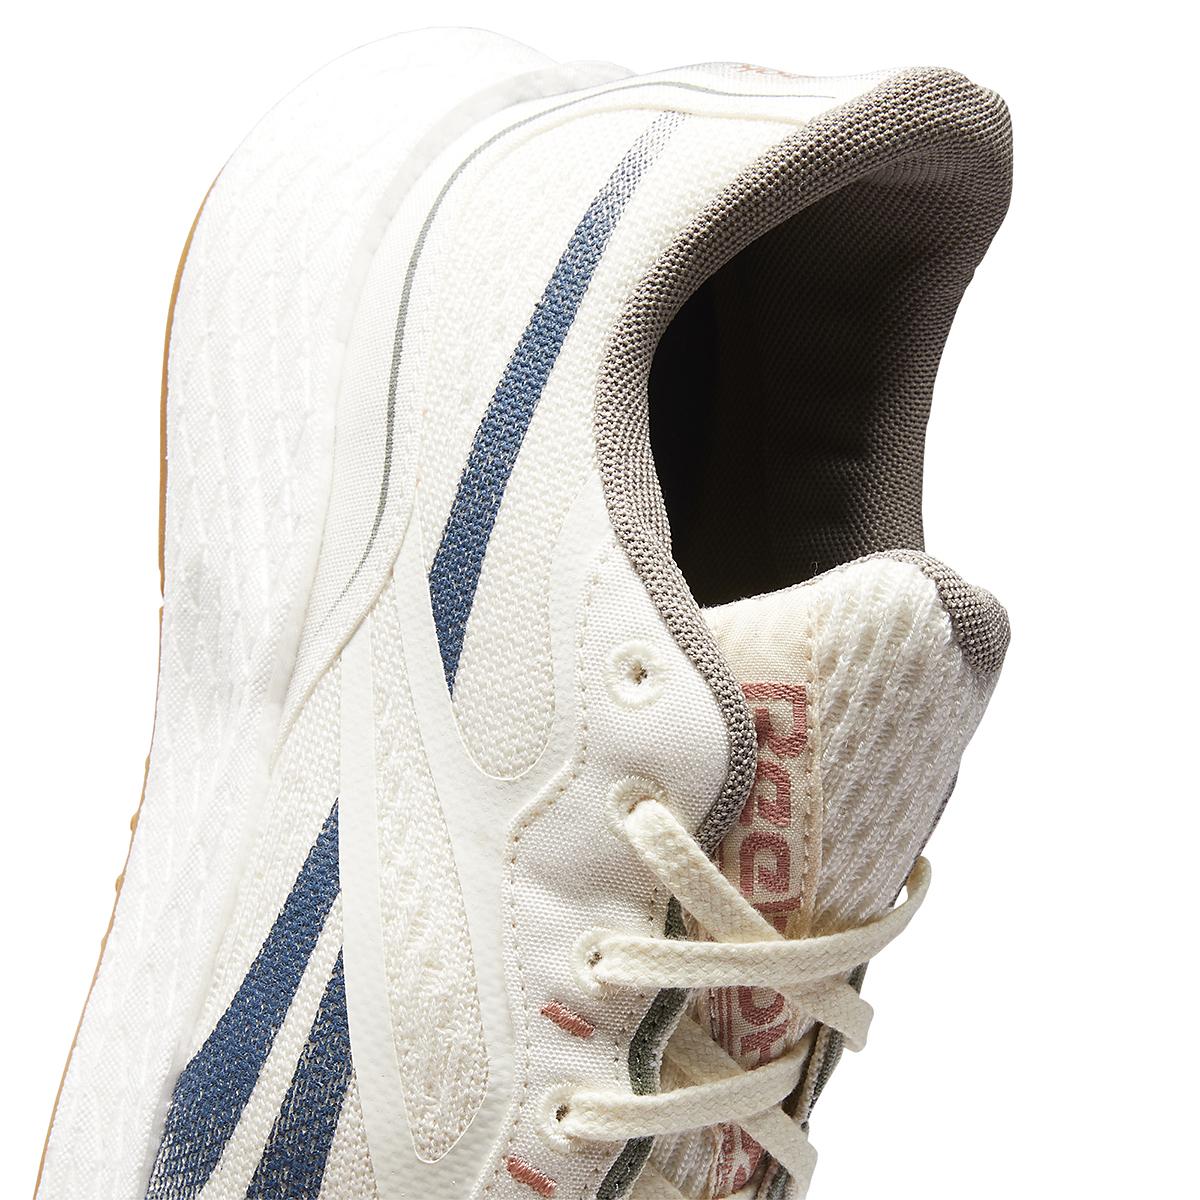 Men's Reebok Floatride Energy Grow Running Shoe - Color: Classic White/Brave Blue/Boulder Grey - Size: 7 - Width: Regular, Classic White/Brave Blue/Boulder Grey, large, image 4